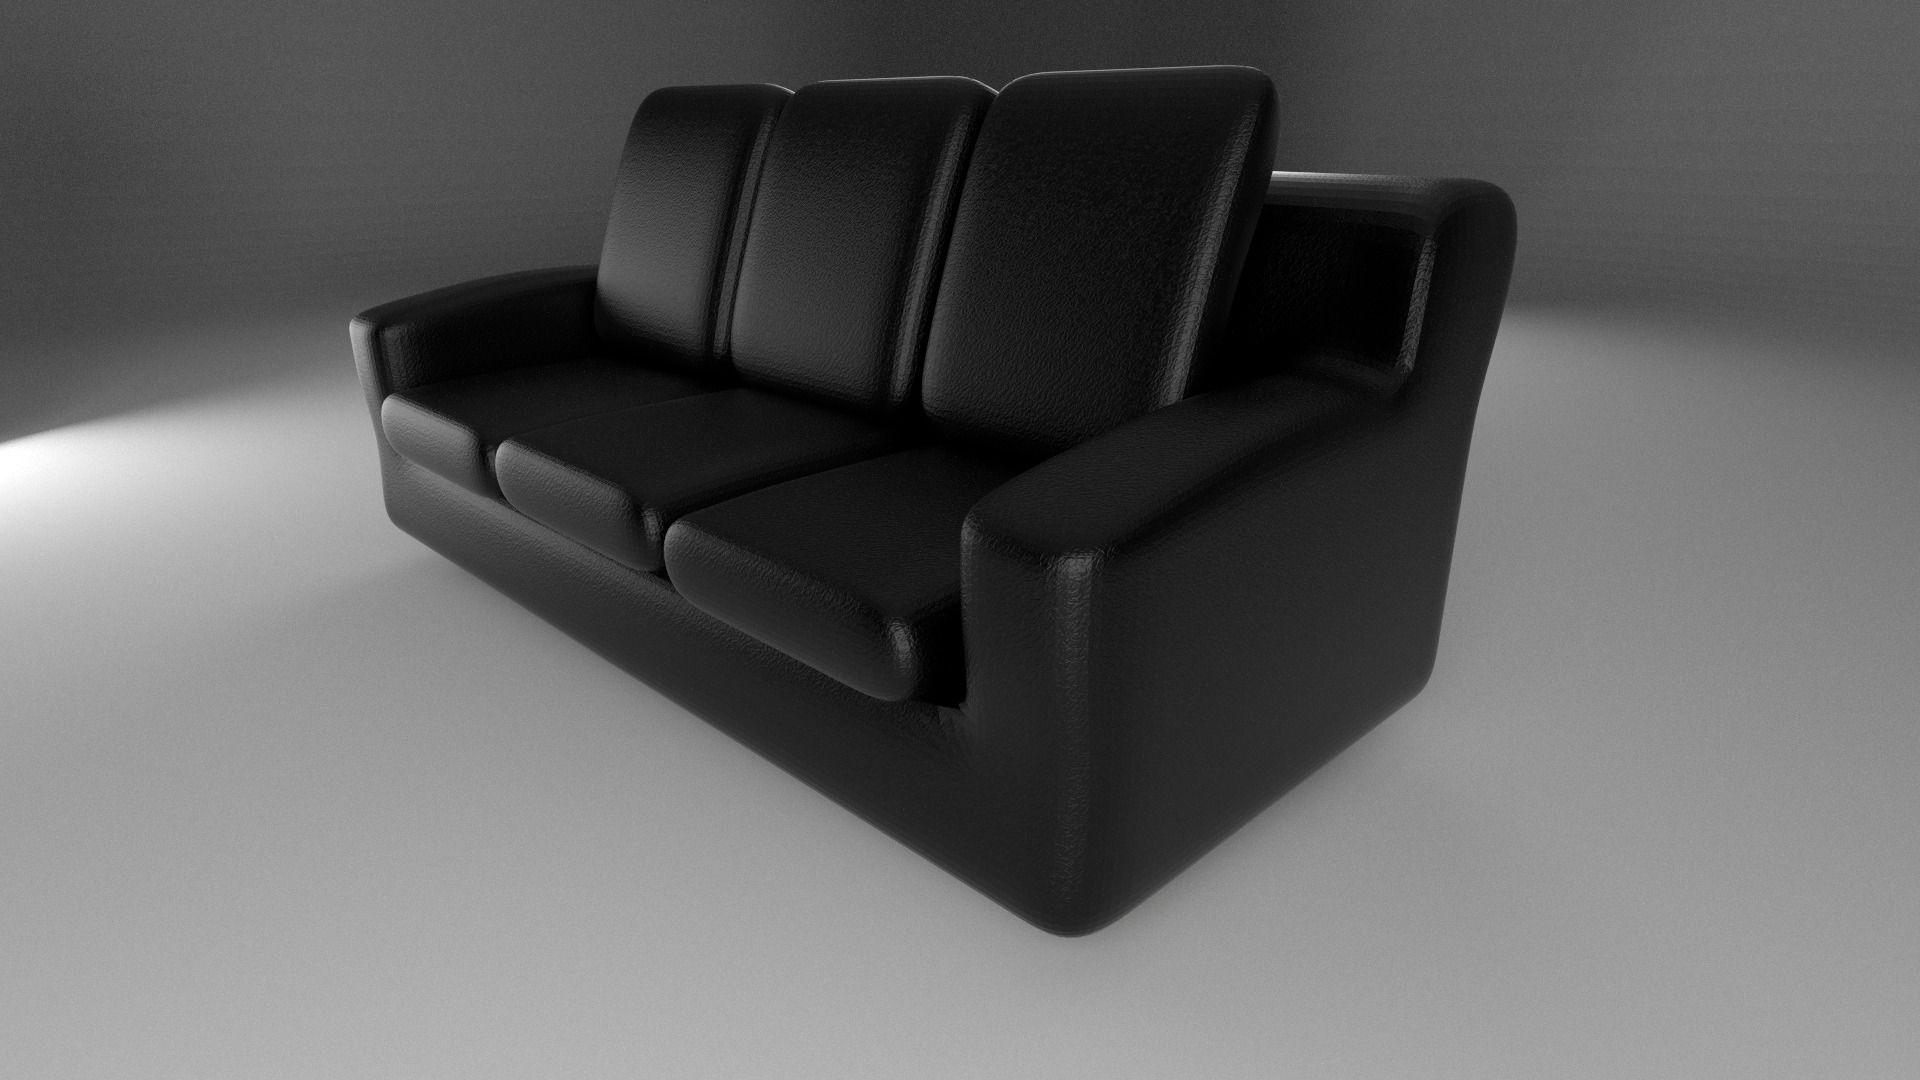 Black Leather Sofa 3d Model Obj Fbx Stl Blend Dae X3d 3